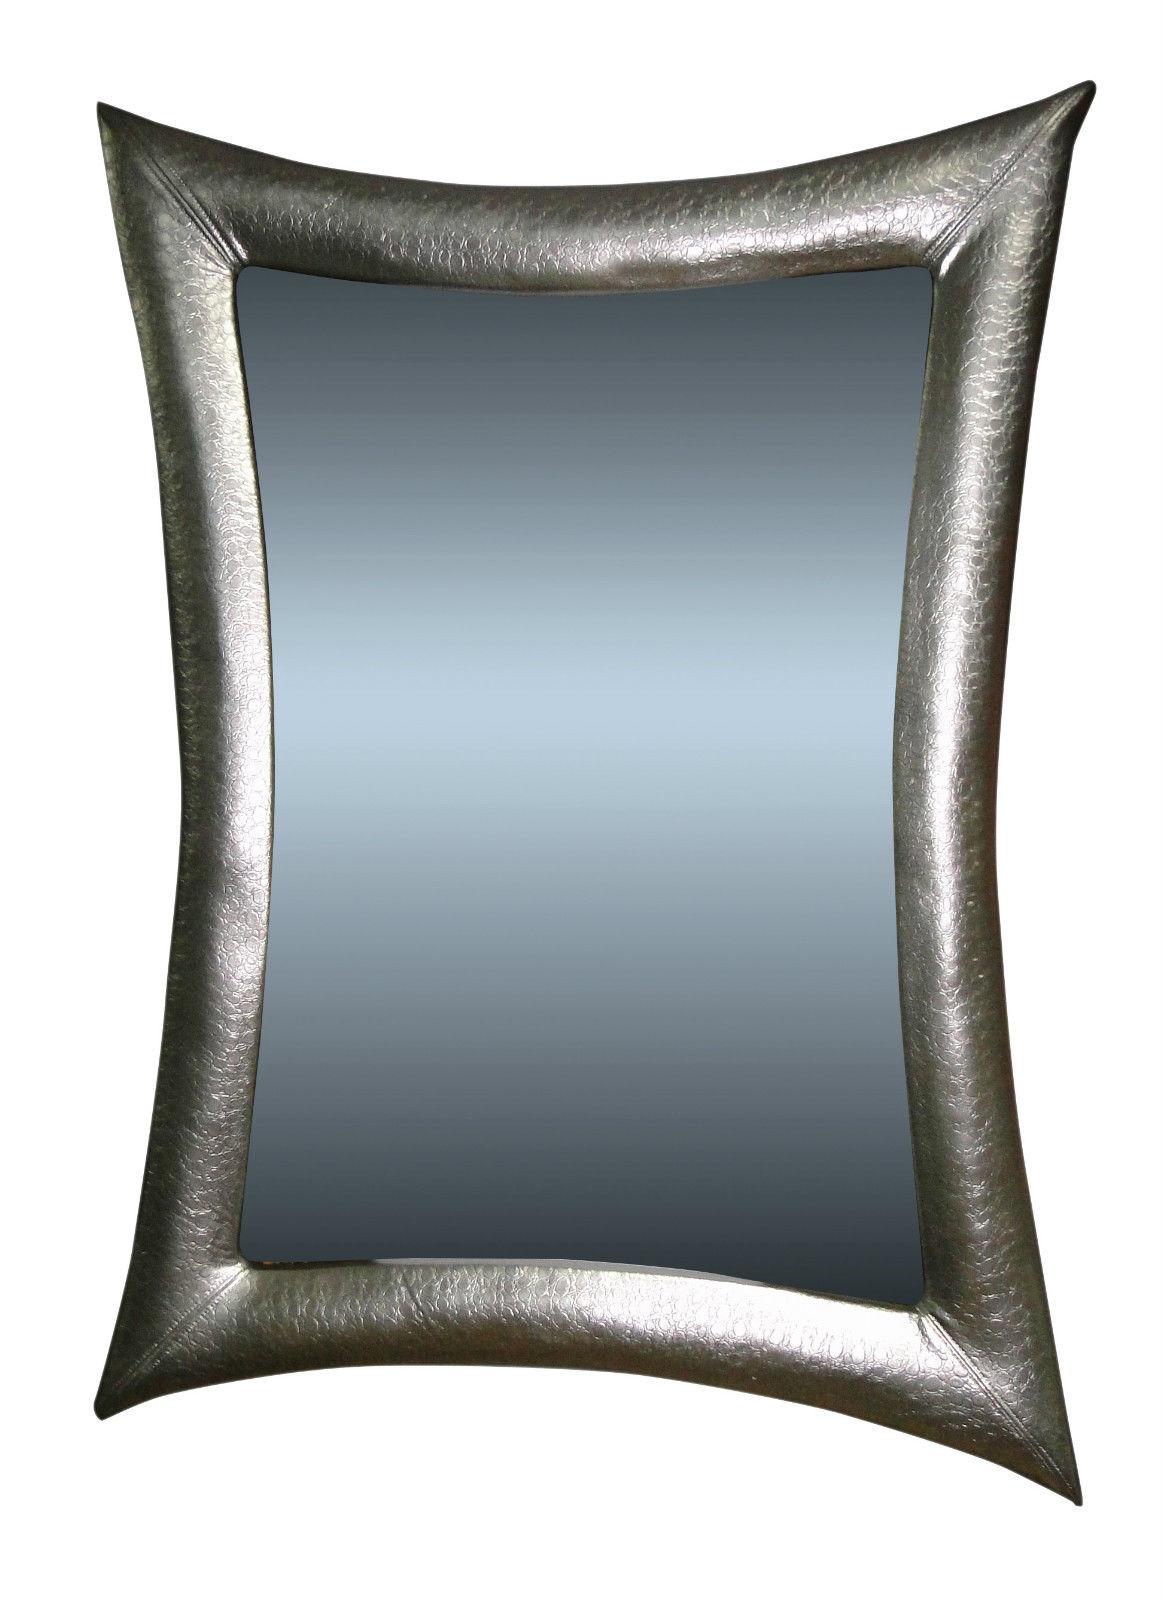 wandspiegel silber spiegel flurspiegel antik 115x85cm. Black Bedroom Furniture Sets. Home Design Ideas